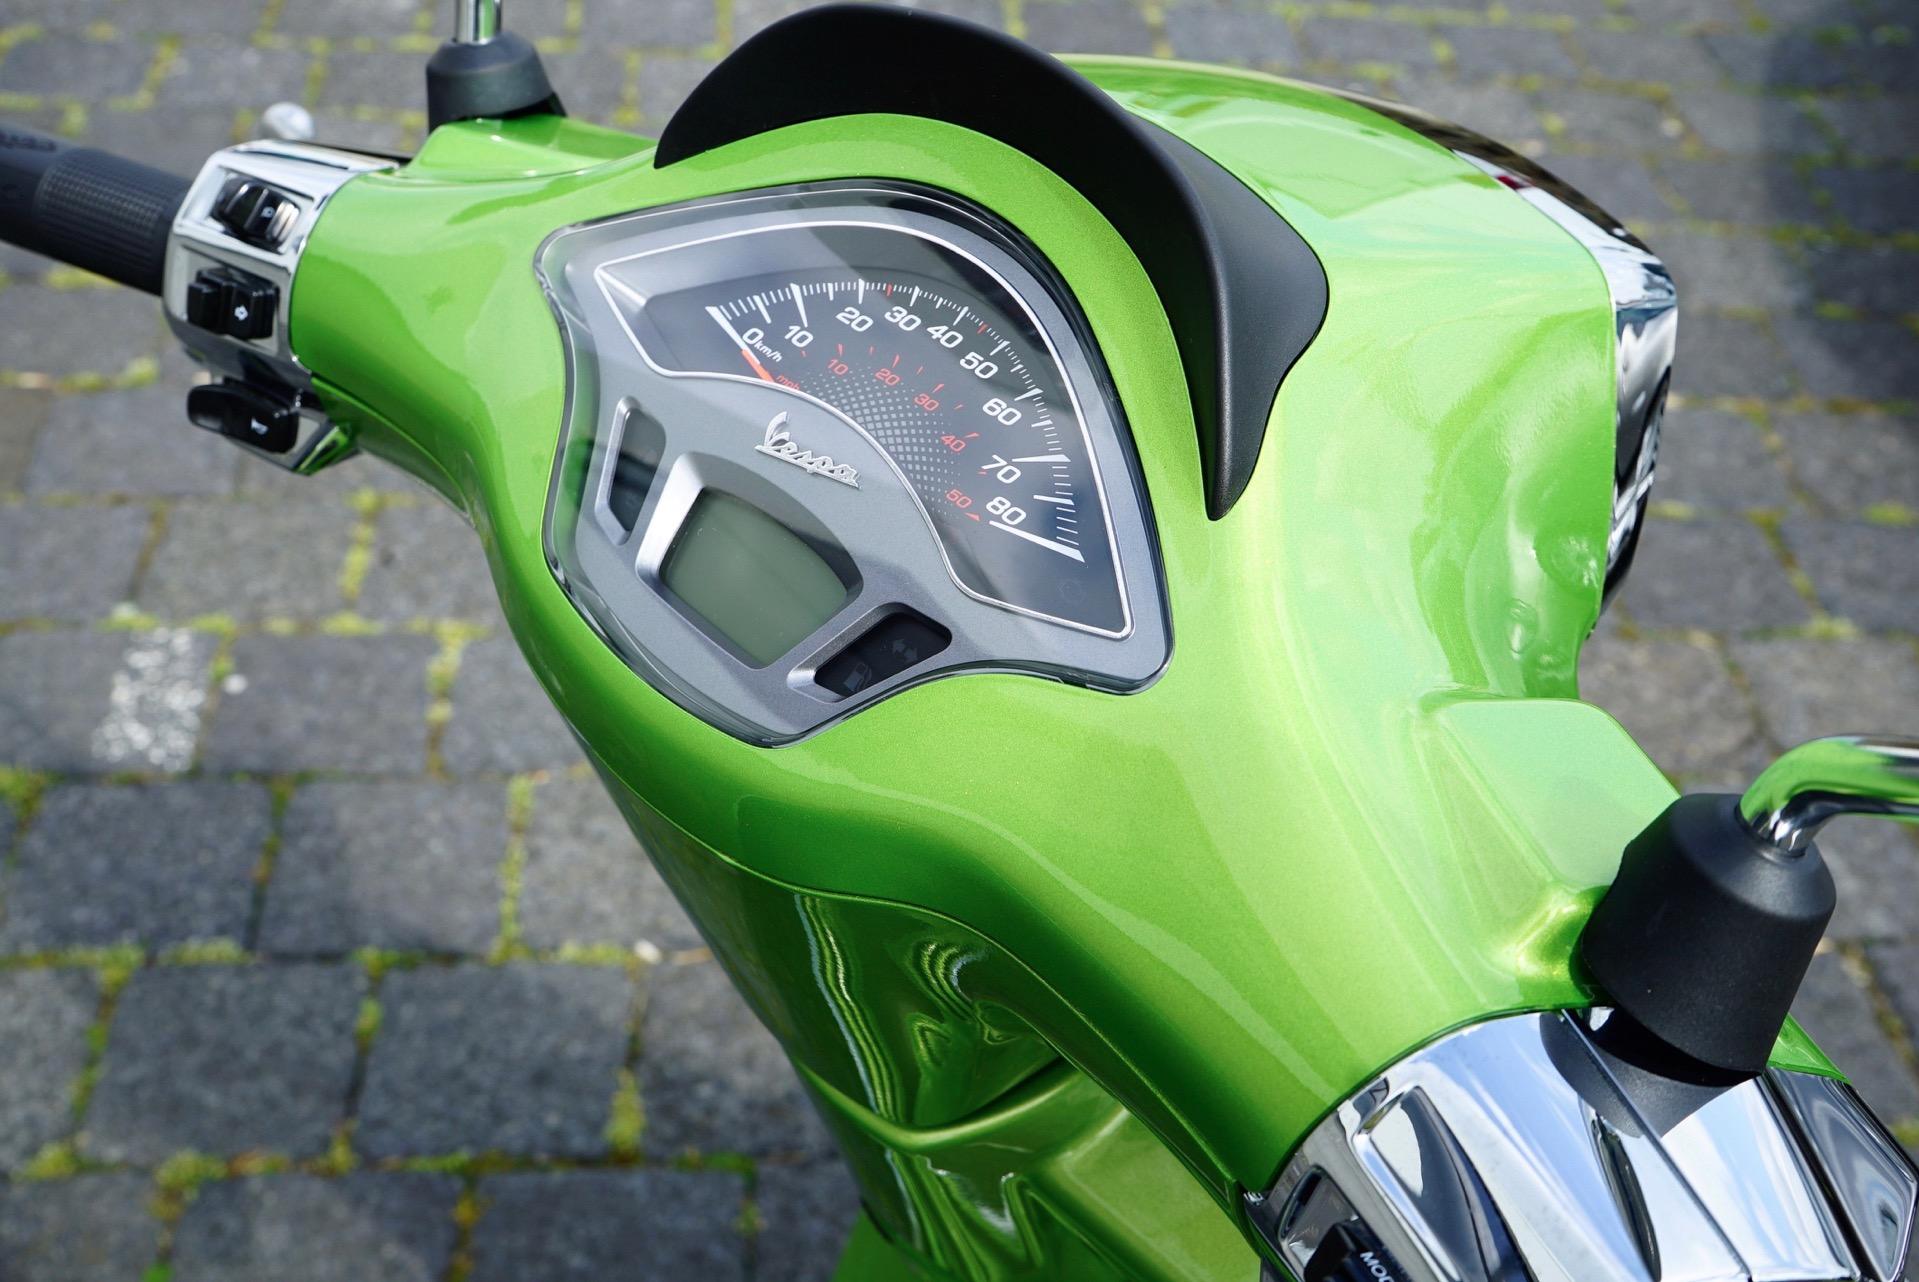 Vespa Groen Voetenruimte Strips